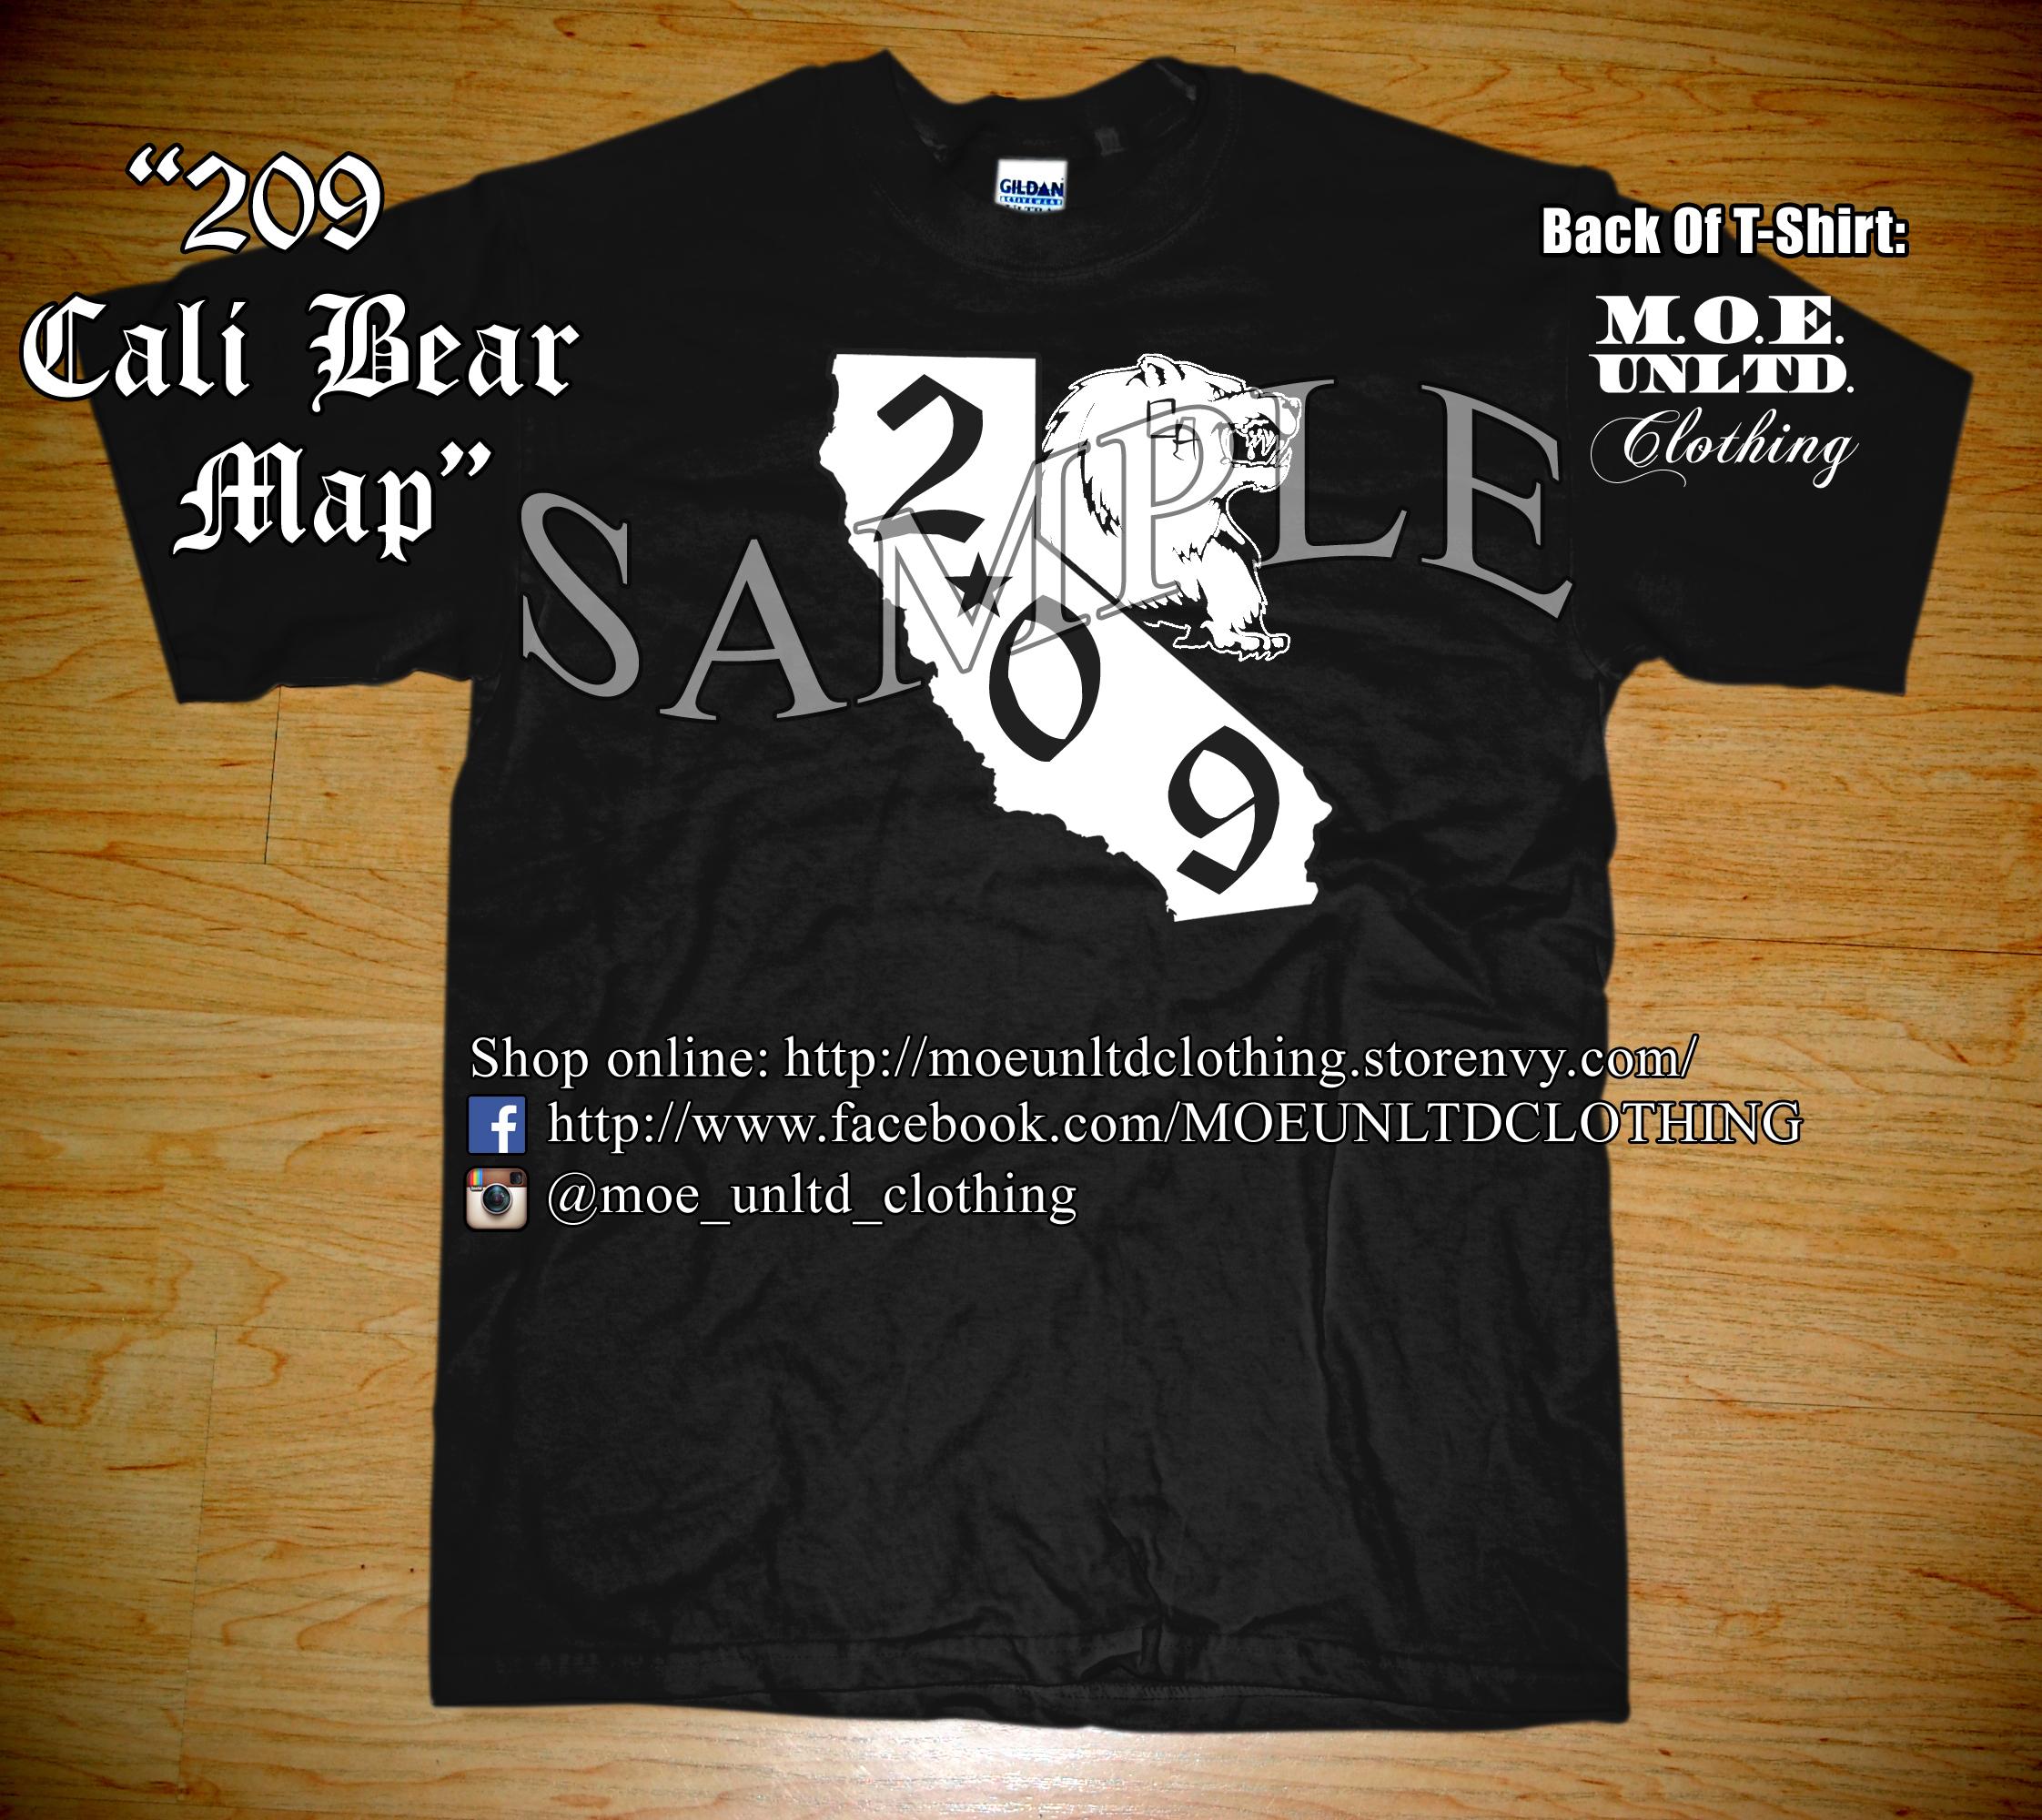 M.o.e. Unltd. Clothing | 209 Cali Bear Map Men's T-Shirt 2Xl-5Xl - California Map T Shirt